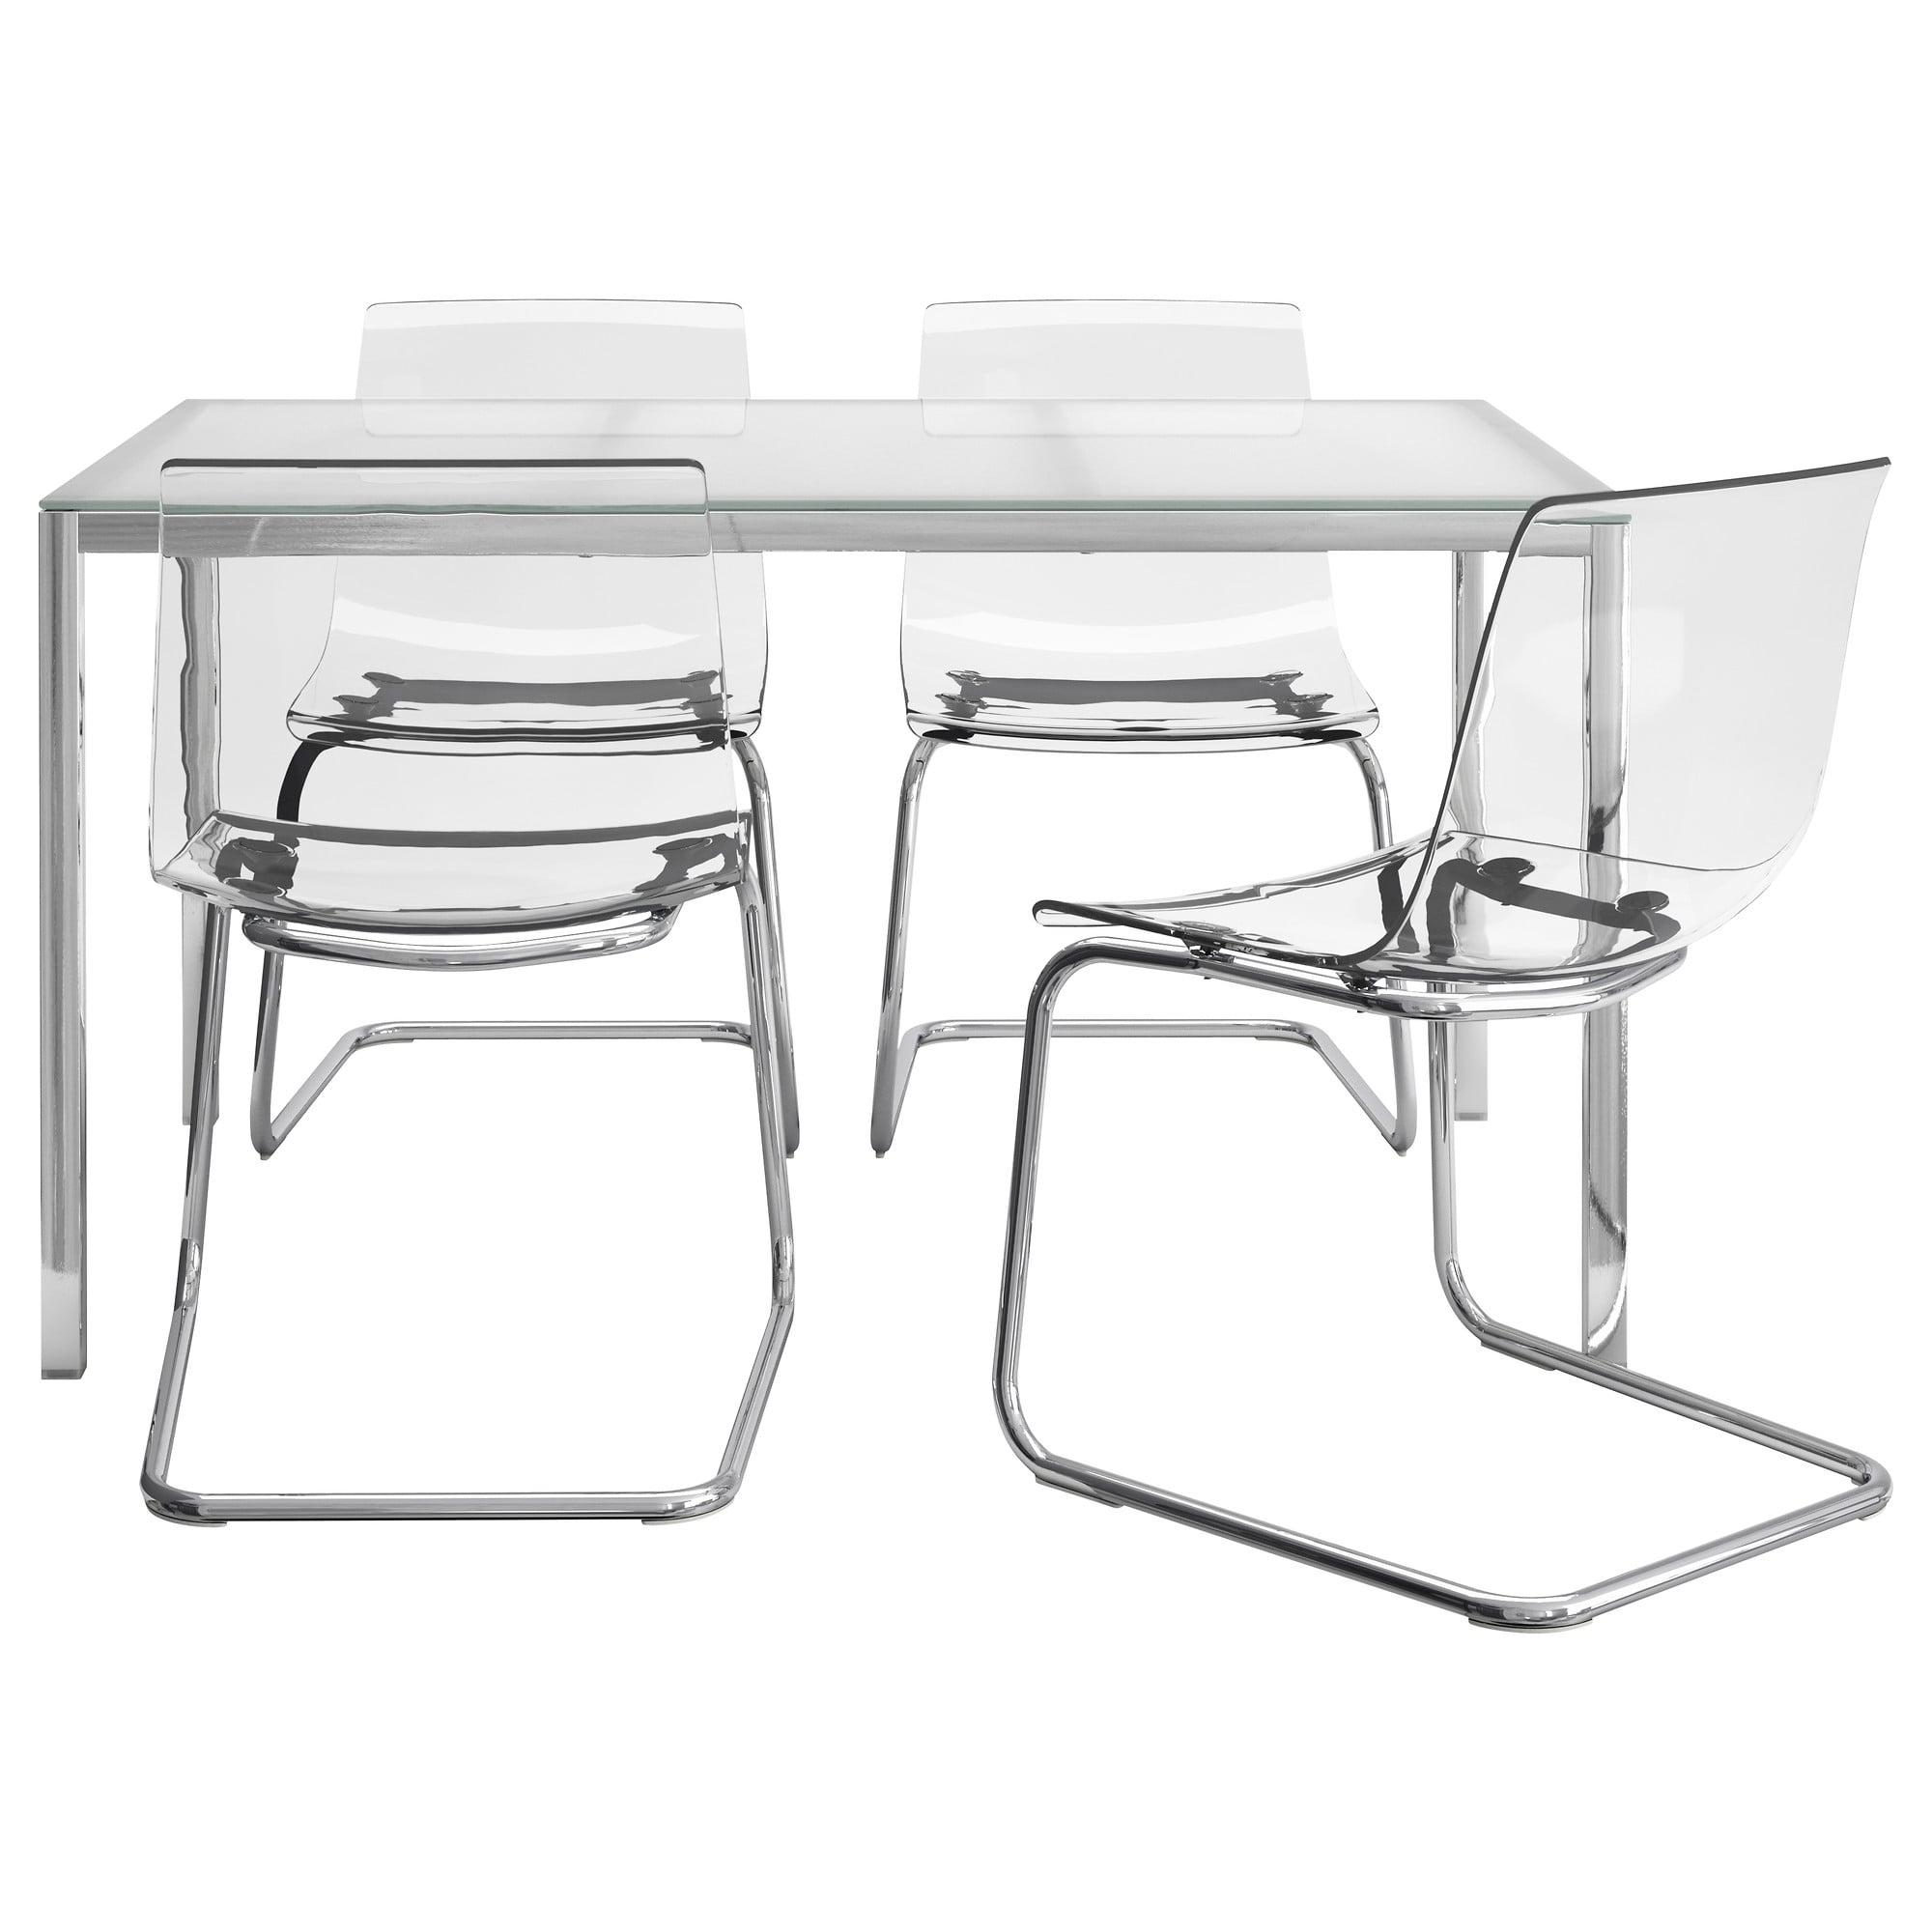 Ikea Mesa Cristal Jxdu torsby tobias Mesa Con 4 Sillas Vidrio Blanco Transparente 135 Cm Ikea